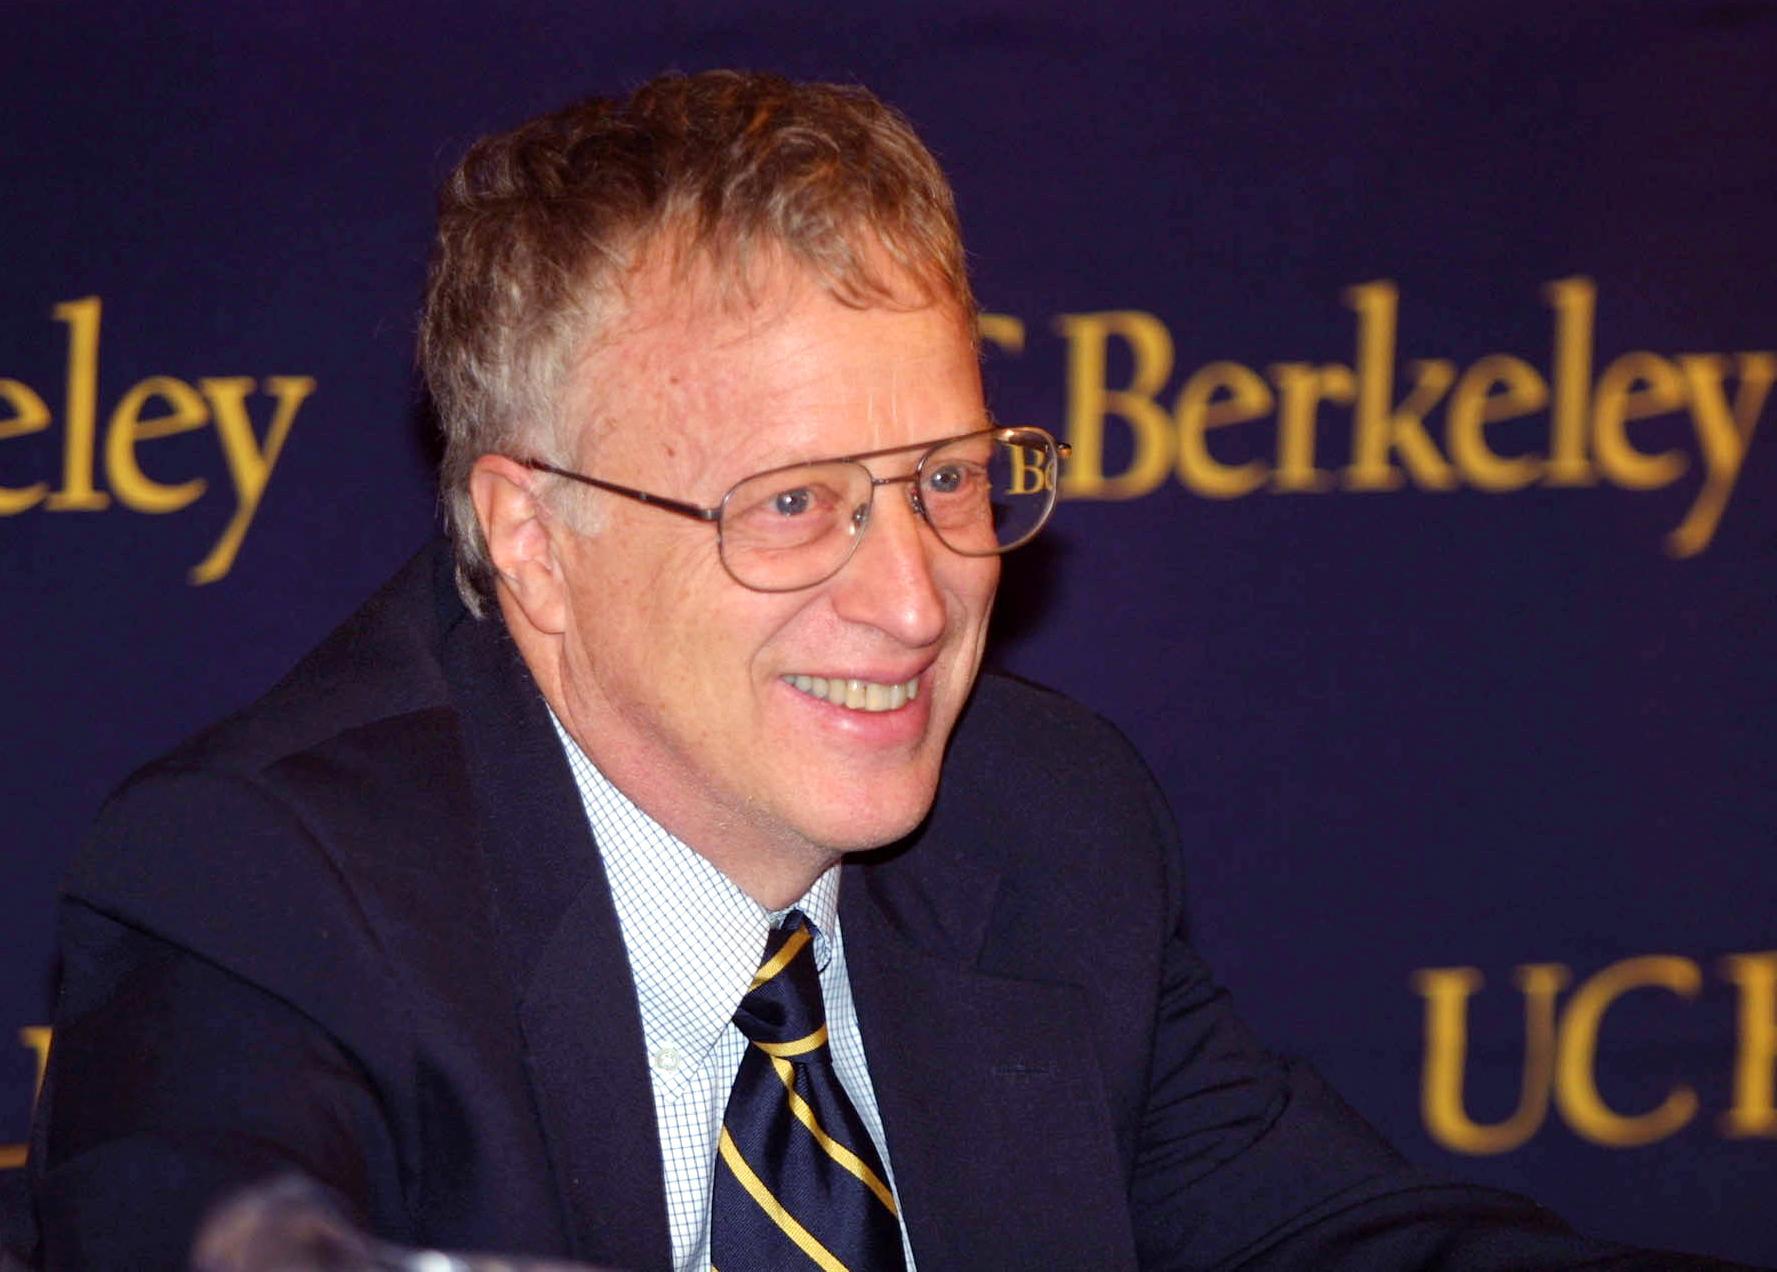 George Akerloff